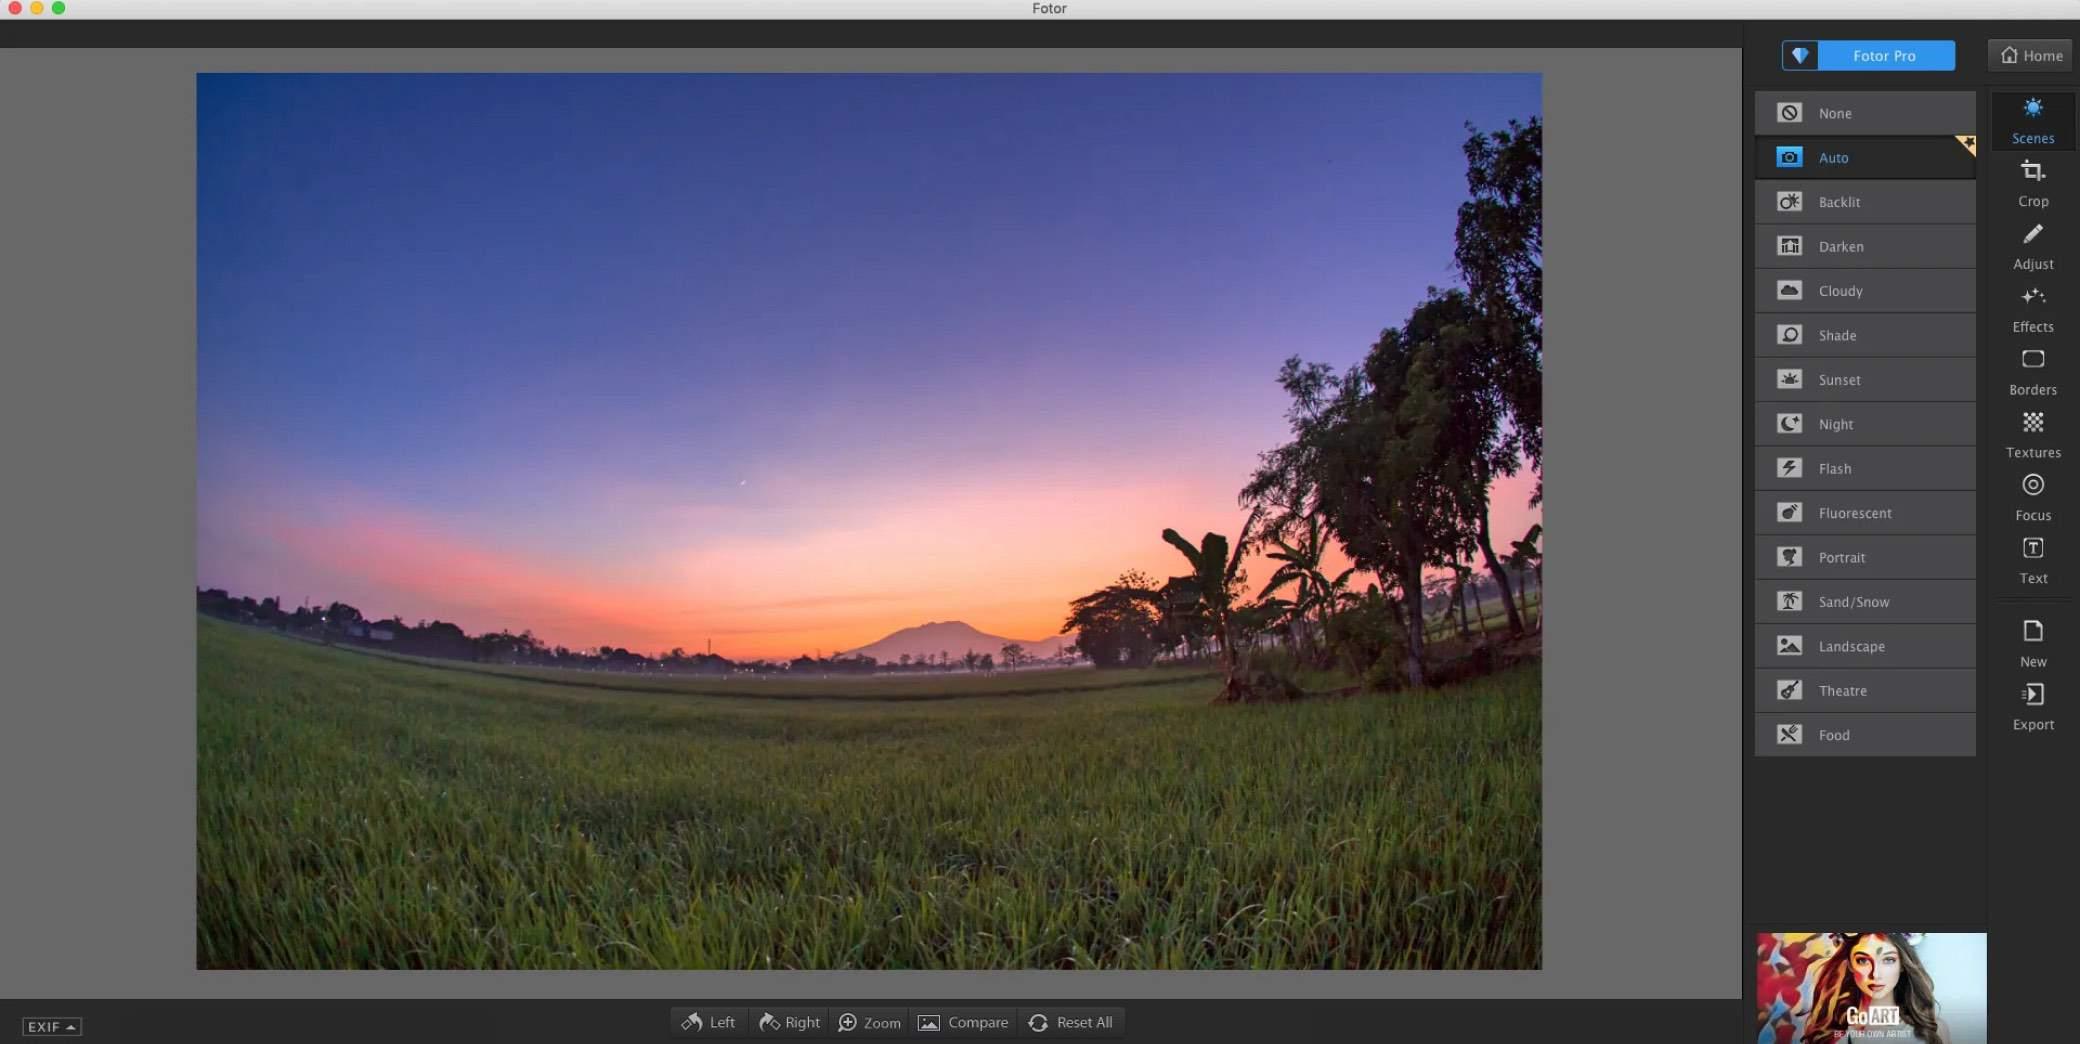 fotor-photo-editor image